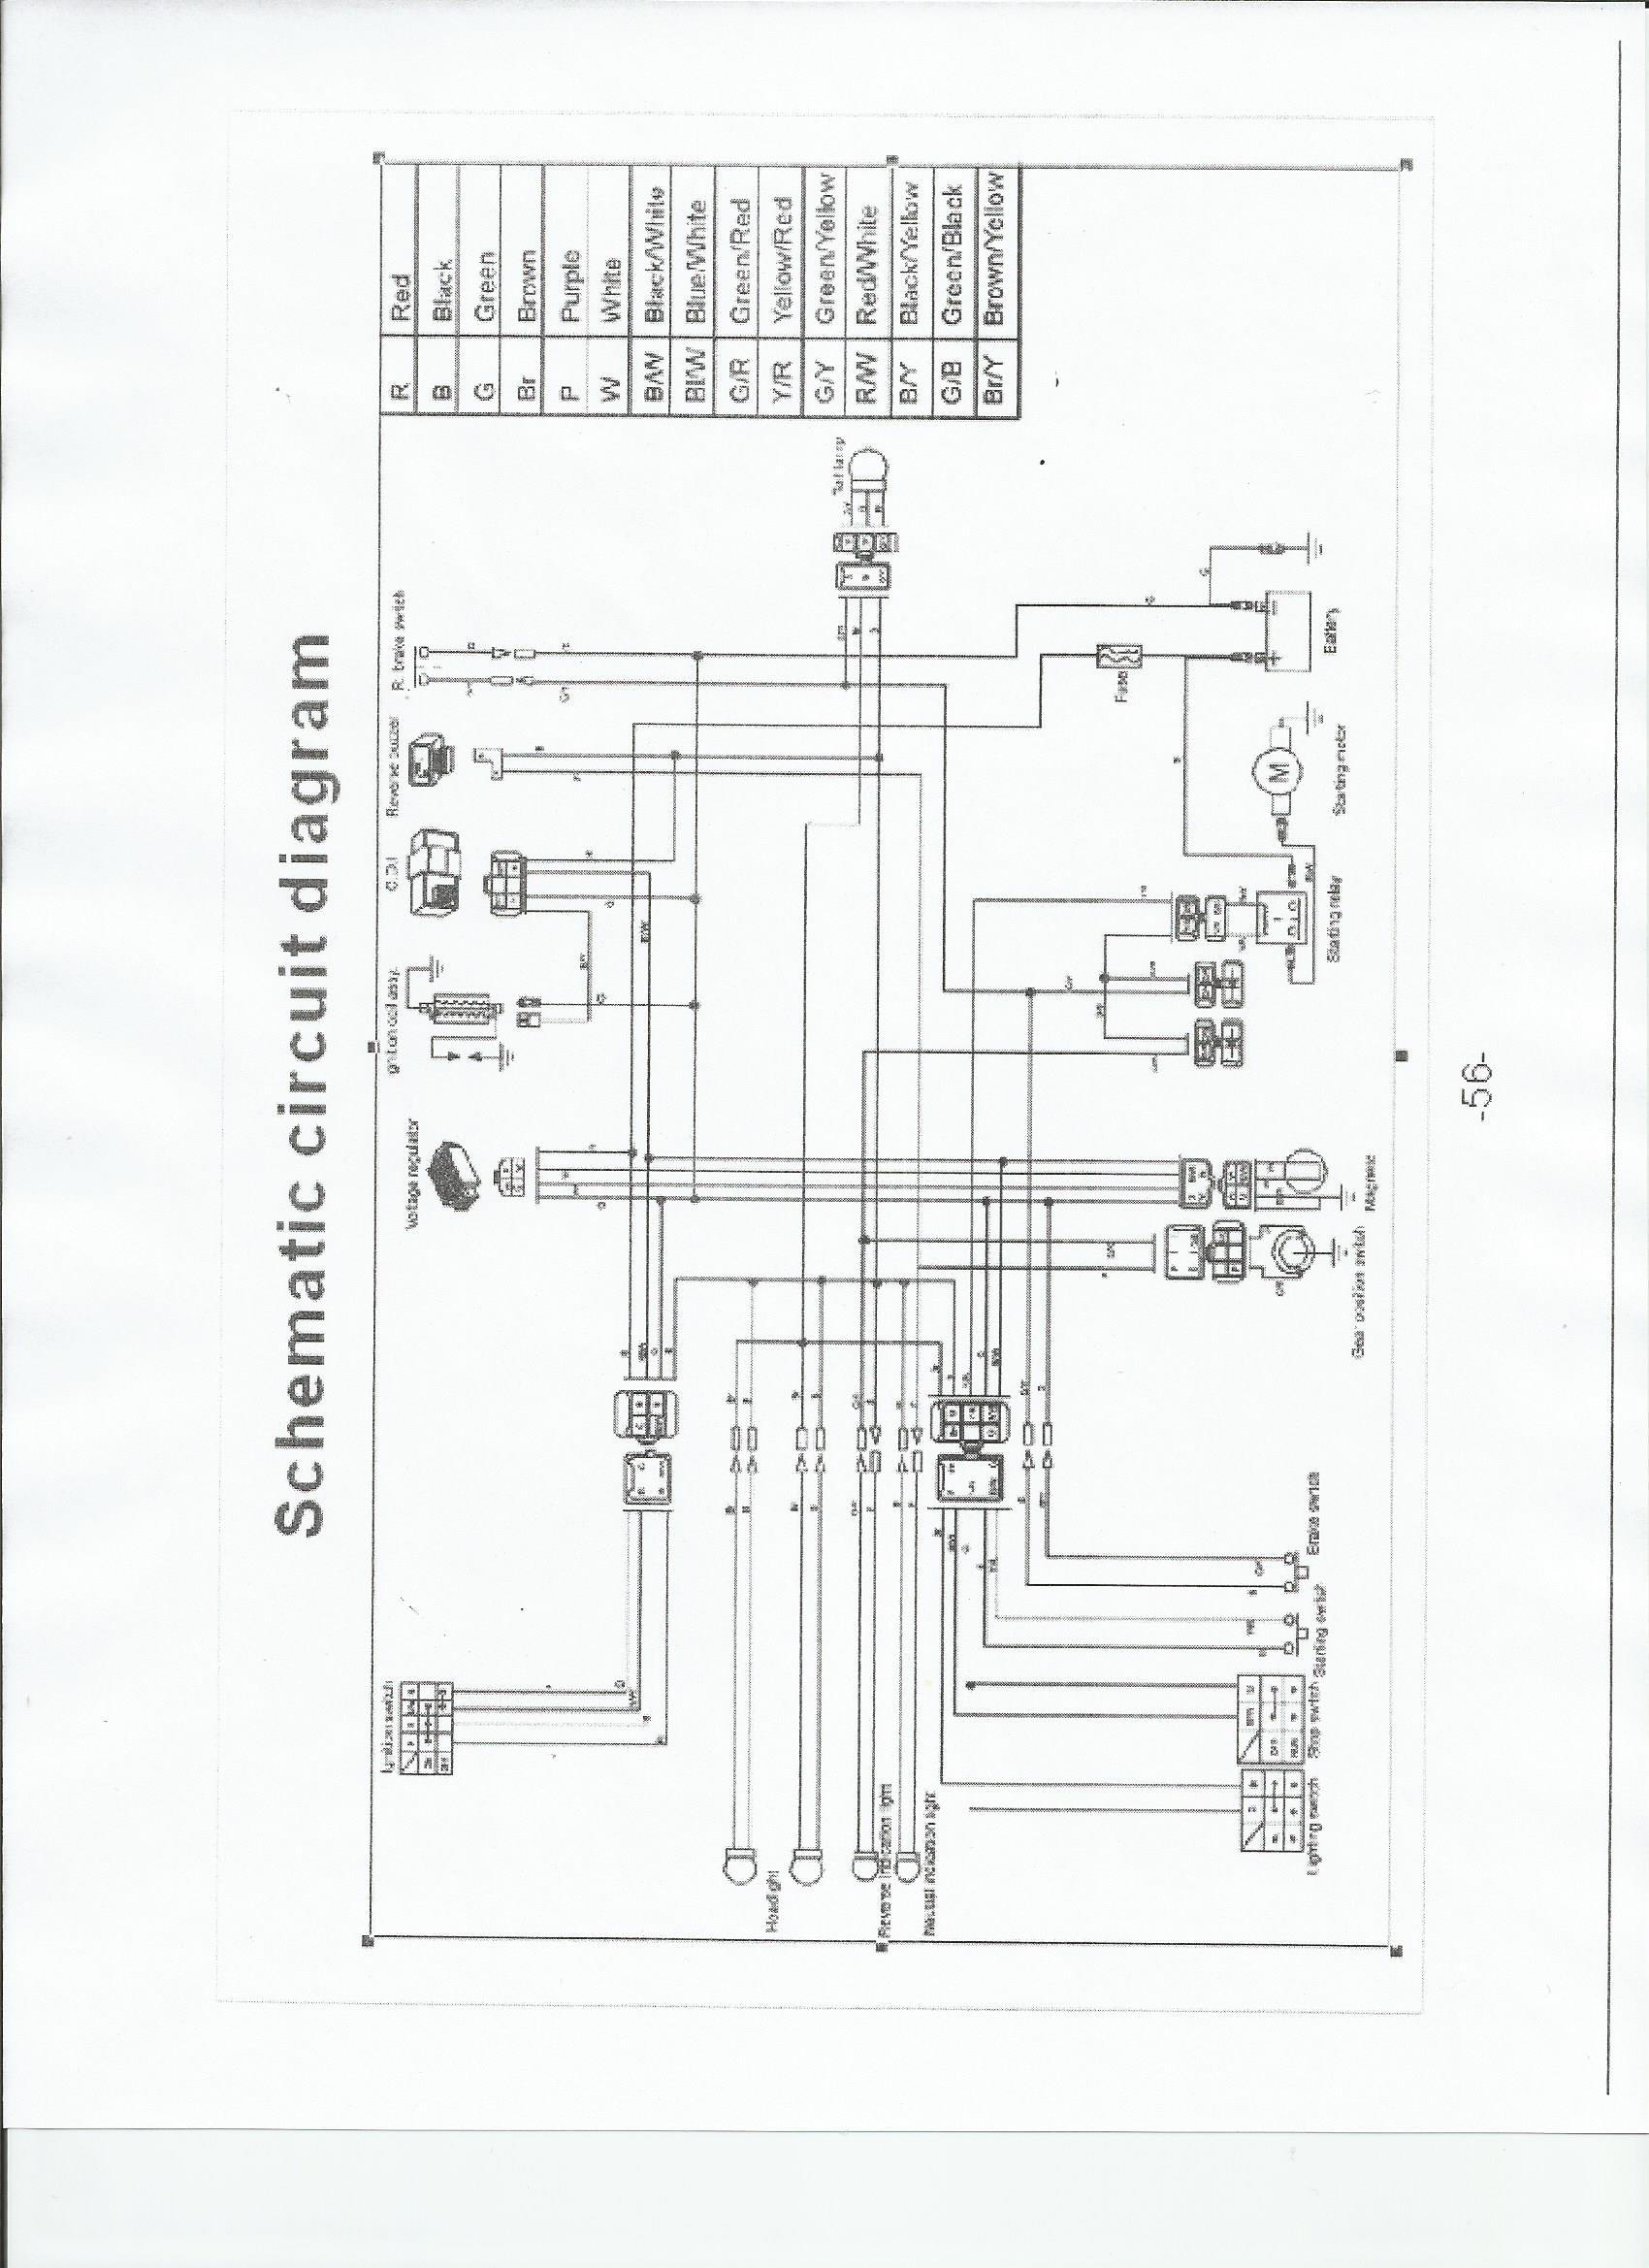 tao tao 50cc atv wiring diagrams wiring diagram portal u2022 rh graphiko co taotao 50cc scooter ignition wiring diagram